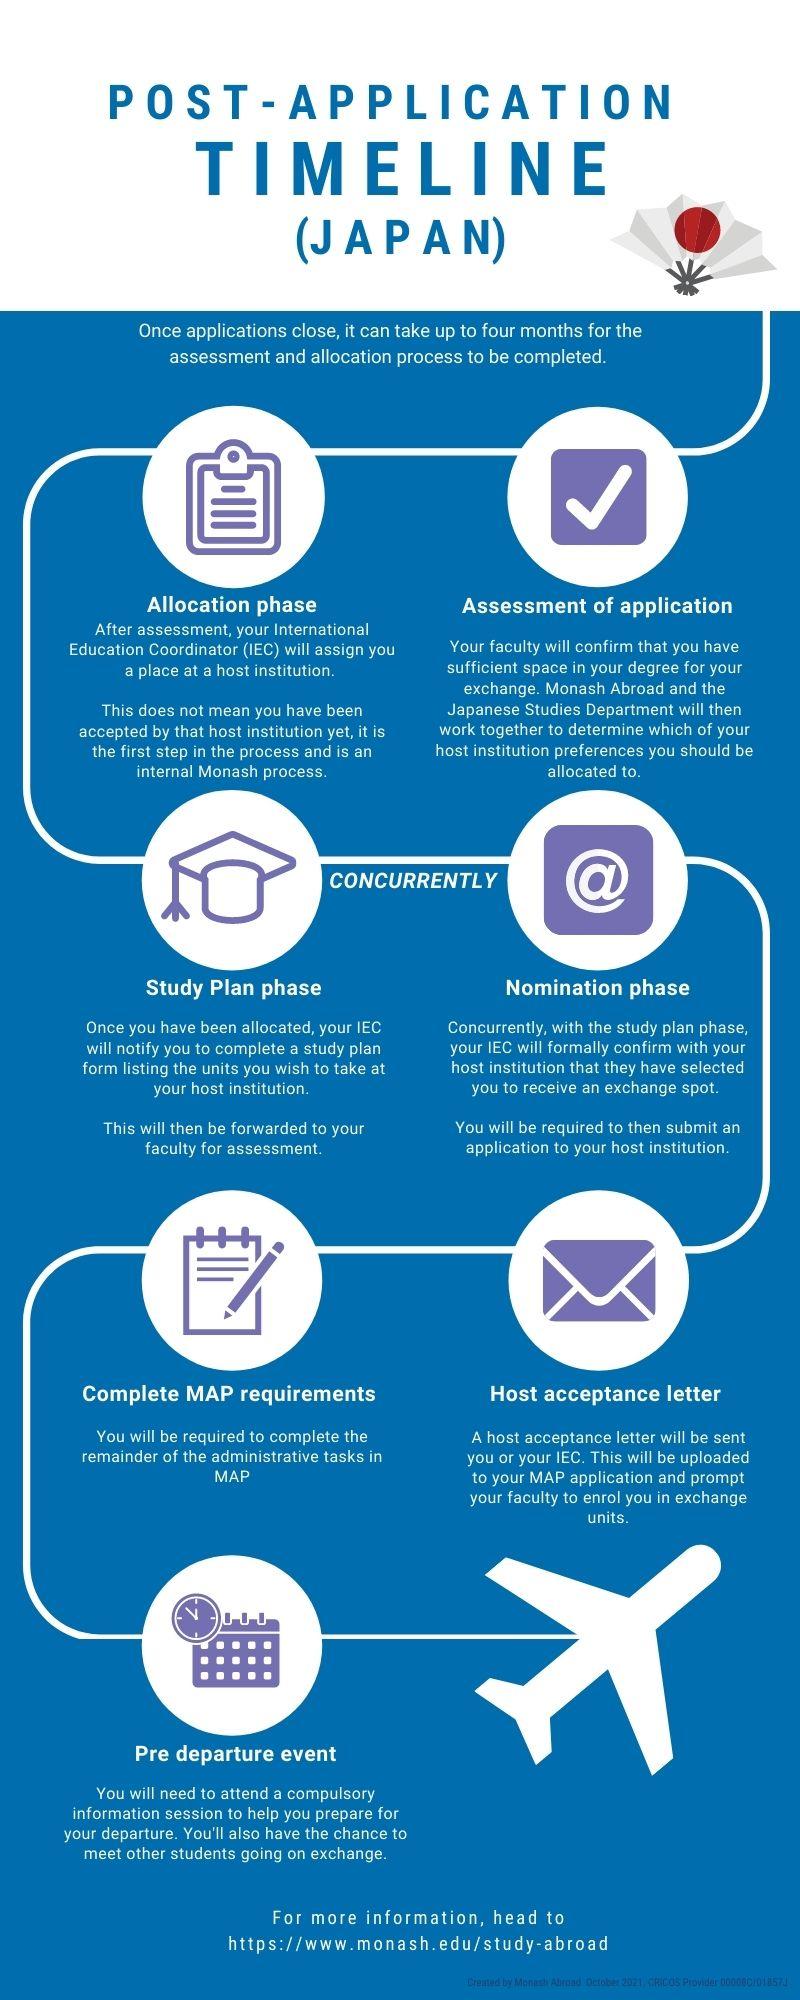 Post-application timeline infographic - Japan